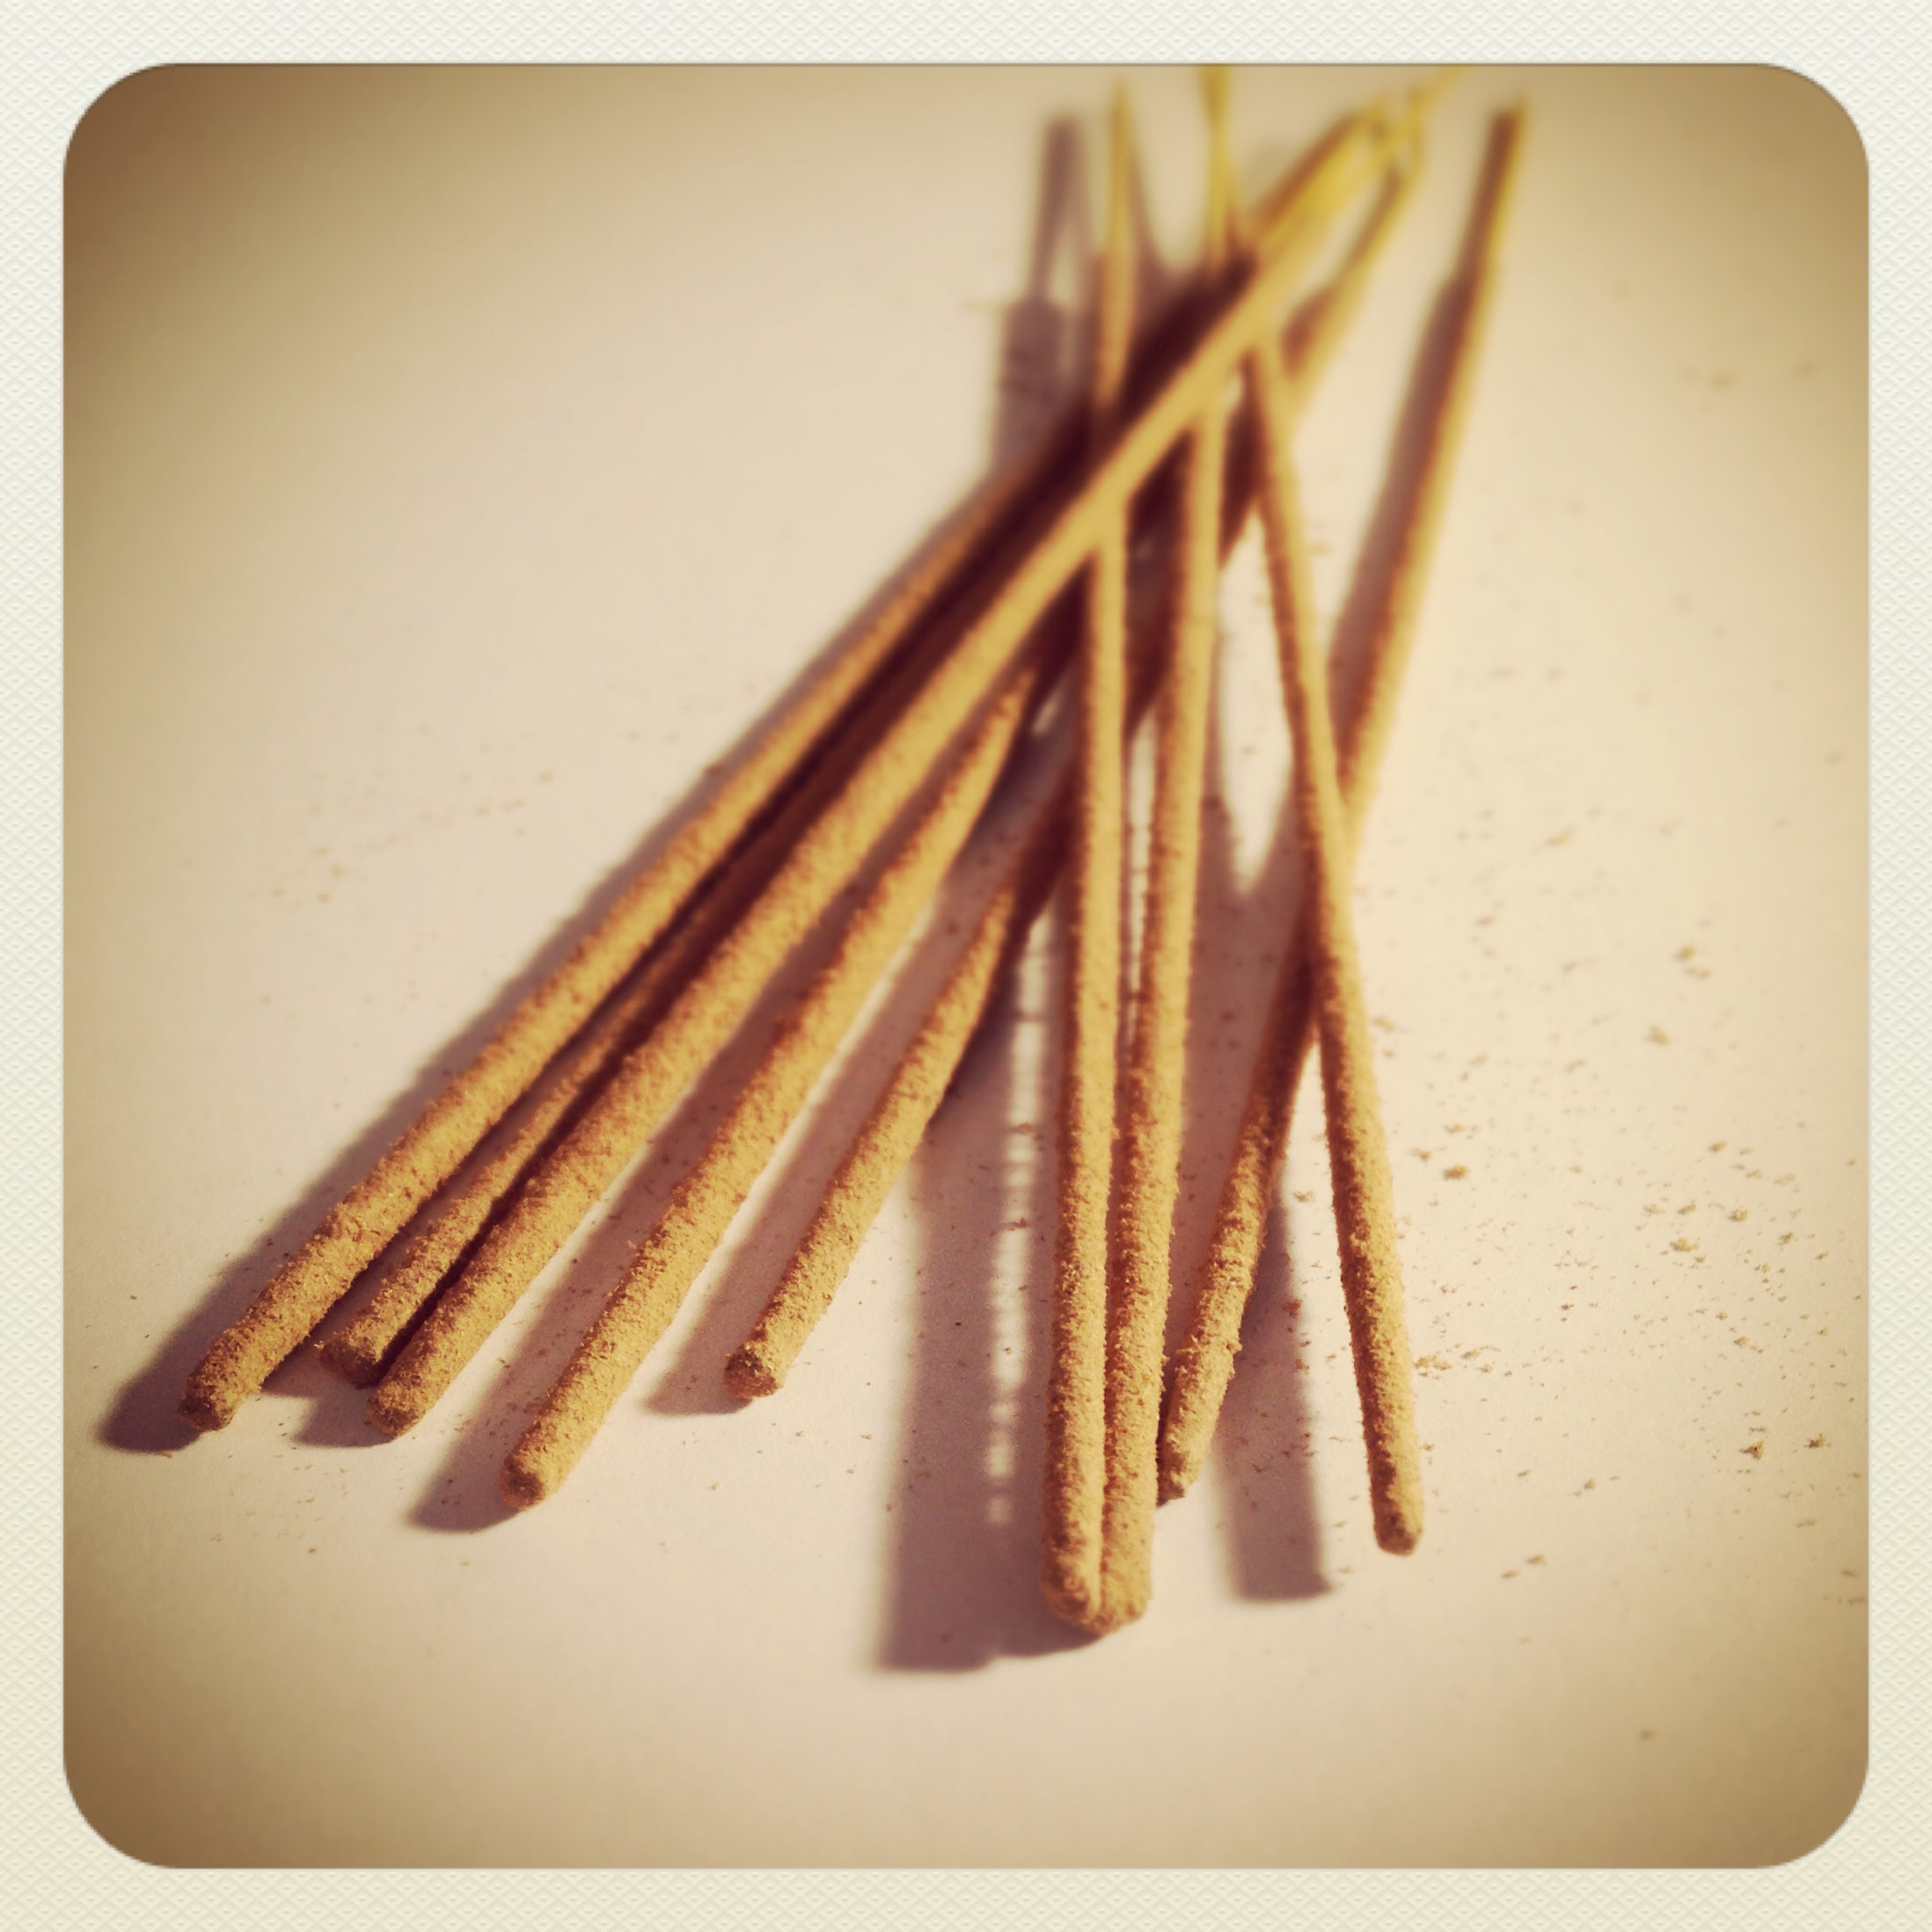 Nag Champa incense - photo by Laurel Regan